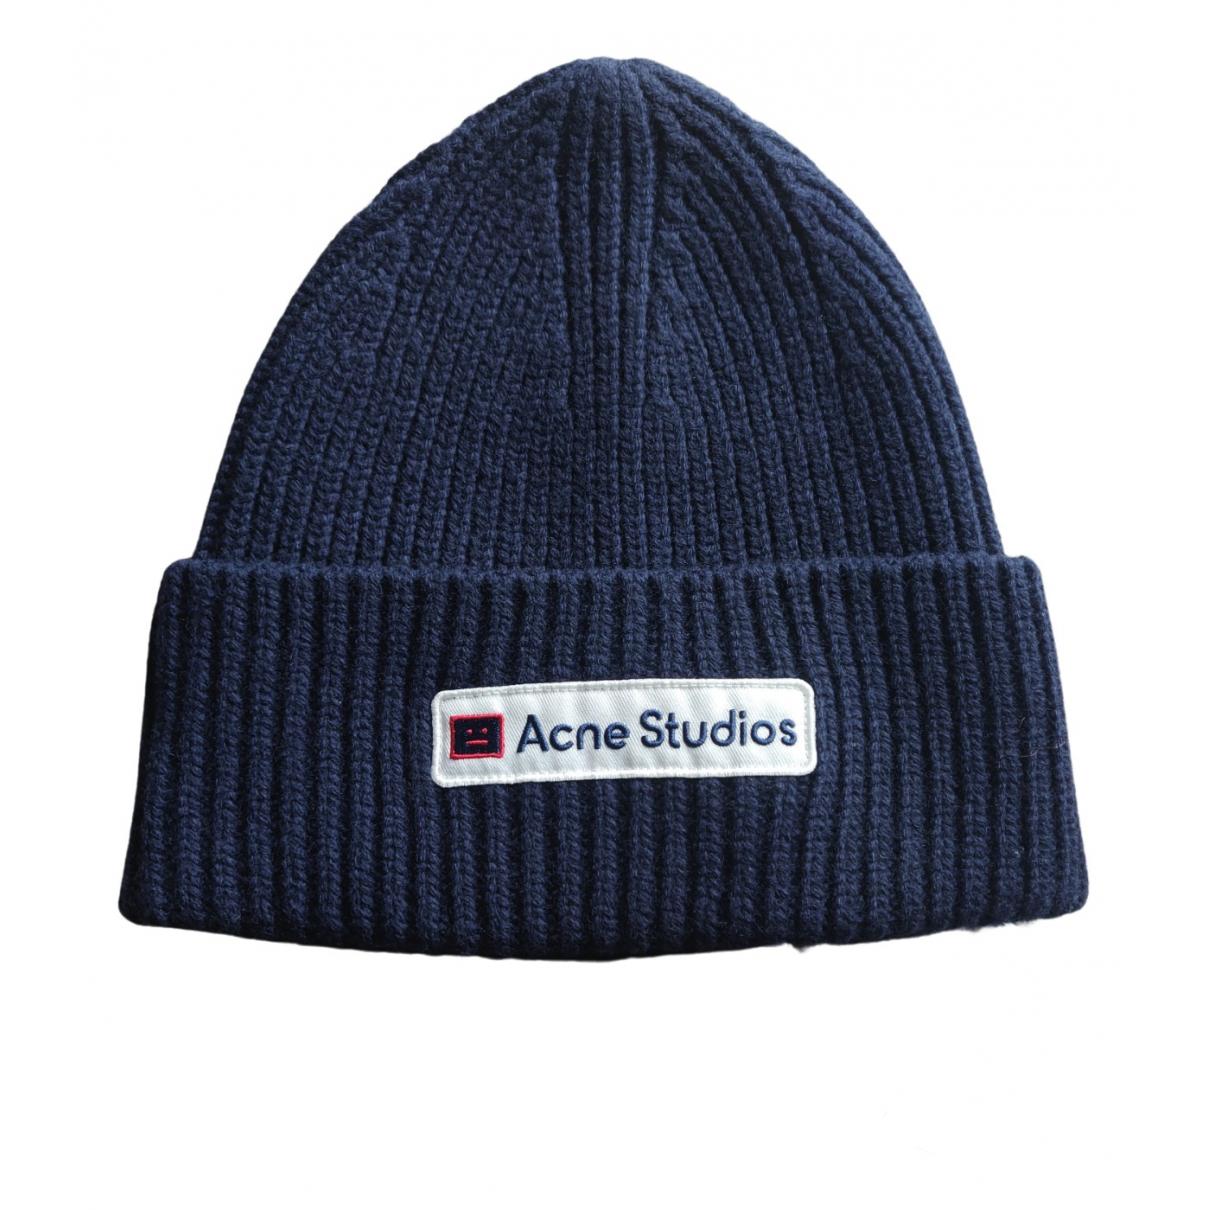 Acne Studios navy Wool Hats & Pull ON Hats